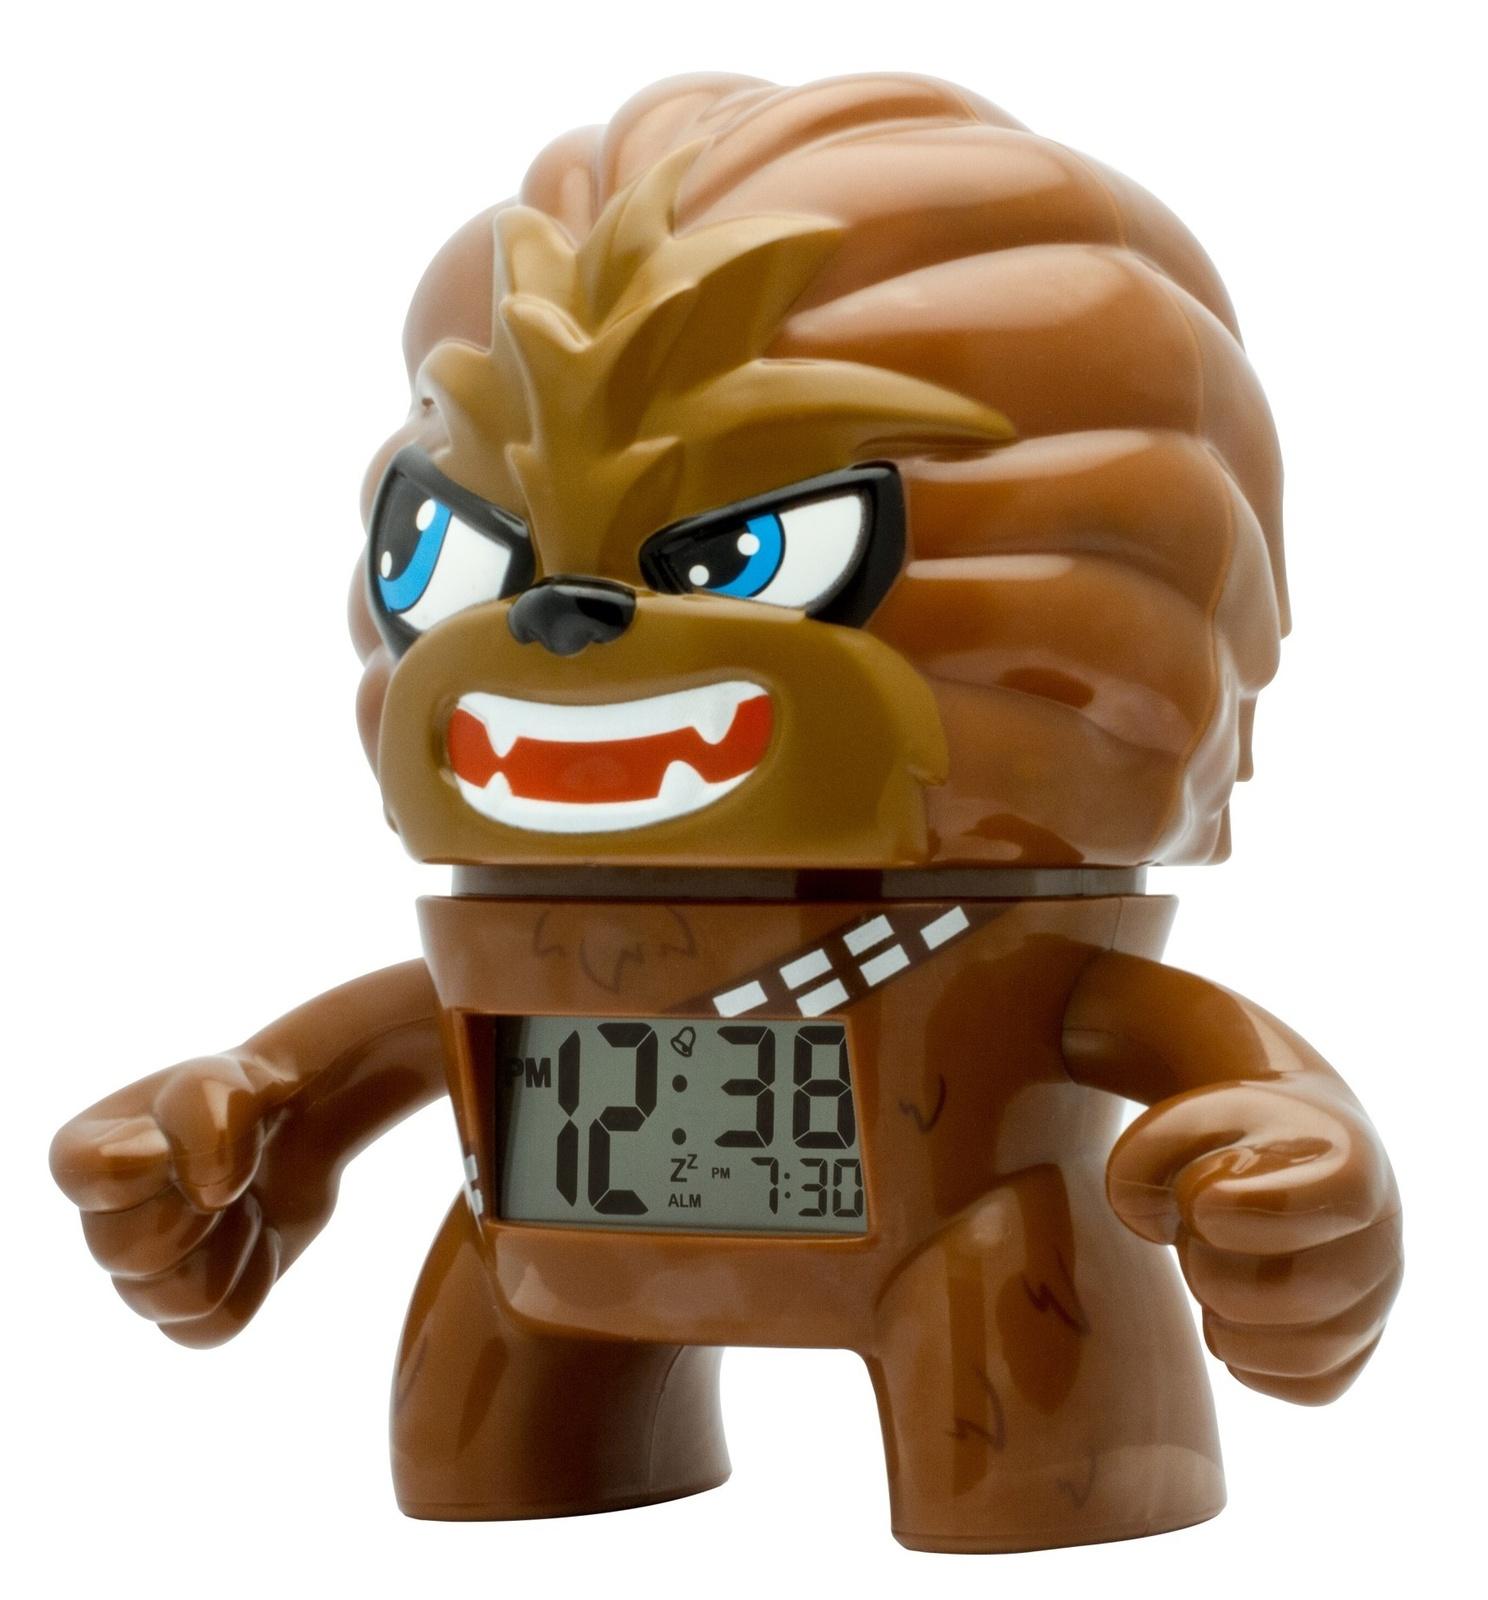 Star Wars: Chewbacca - Bulb Botz Alarm Clock image